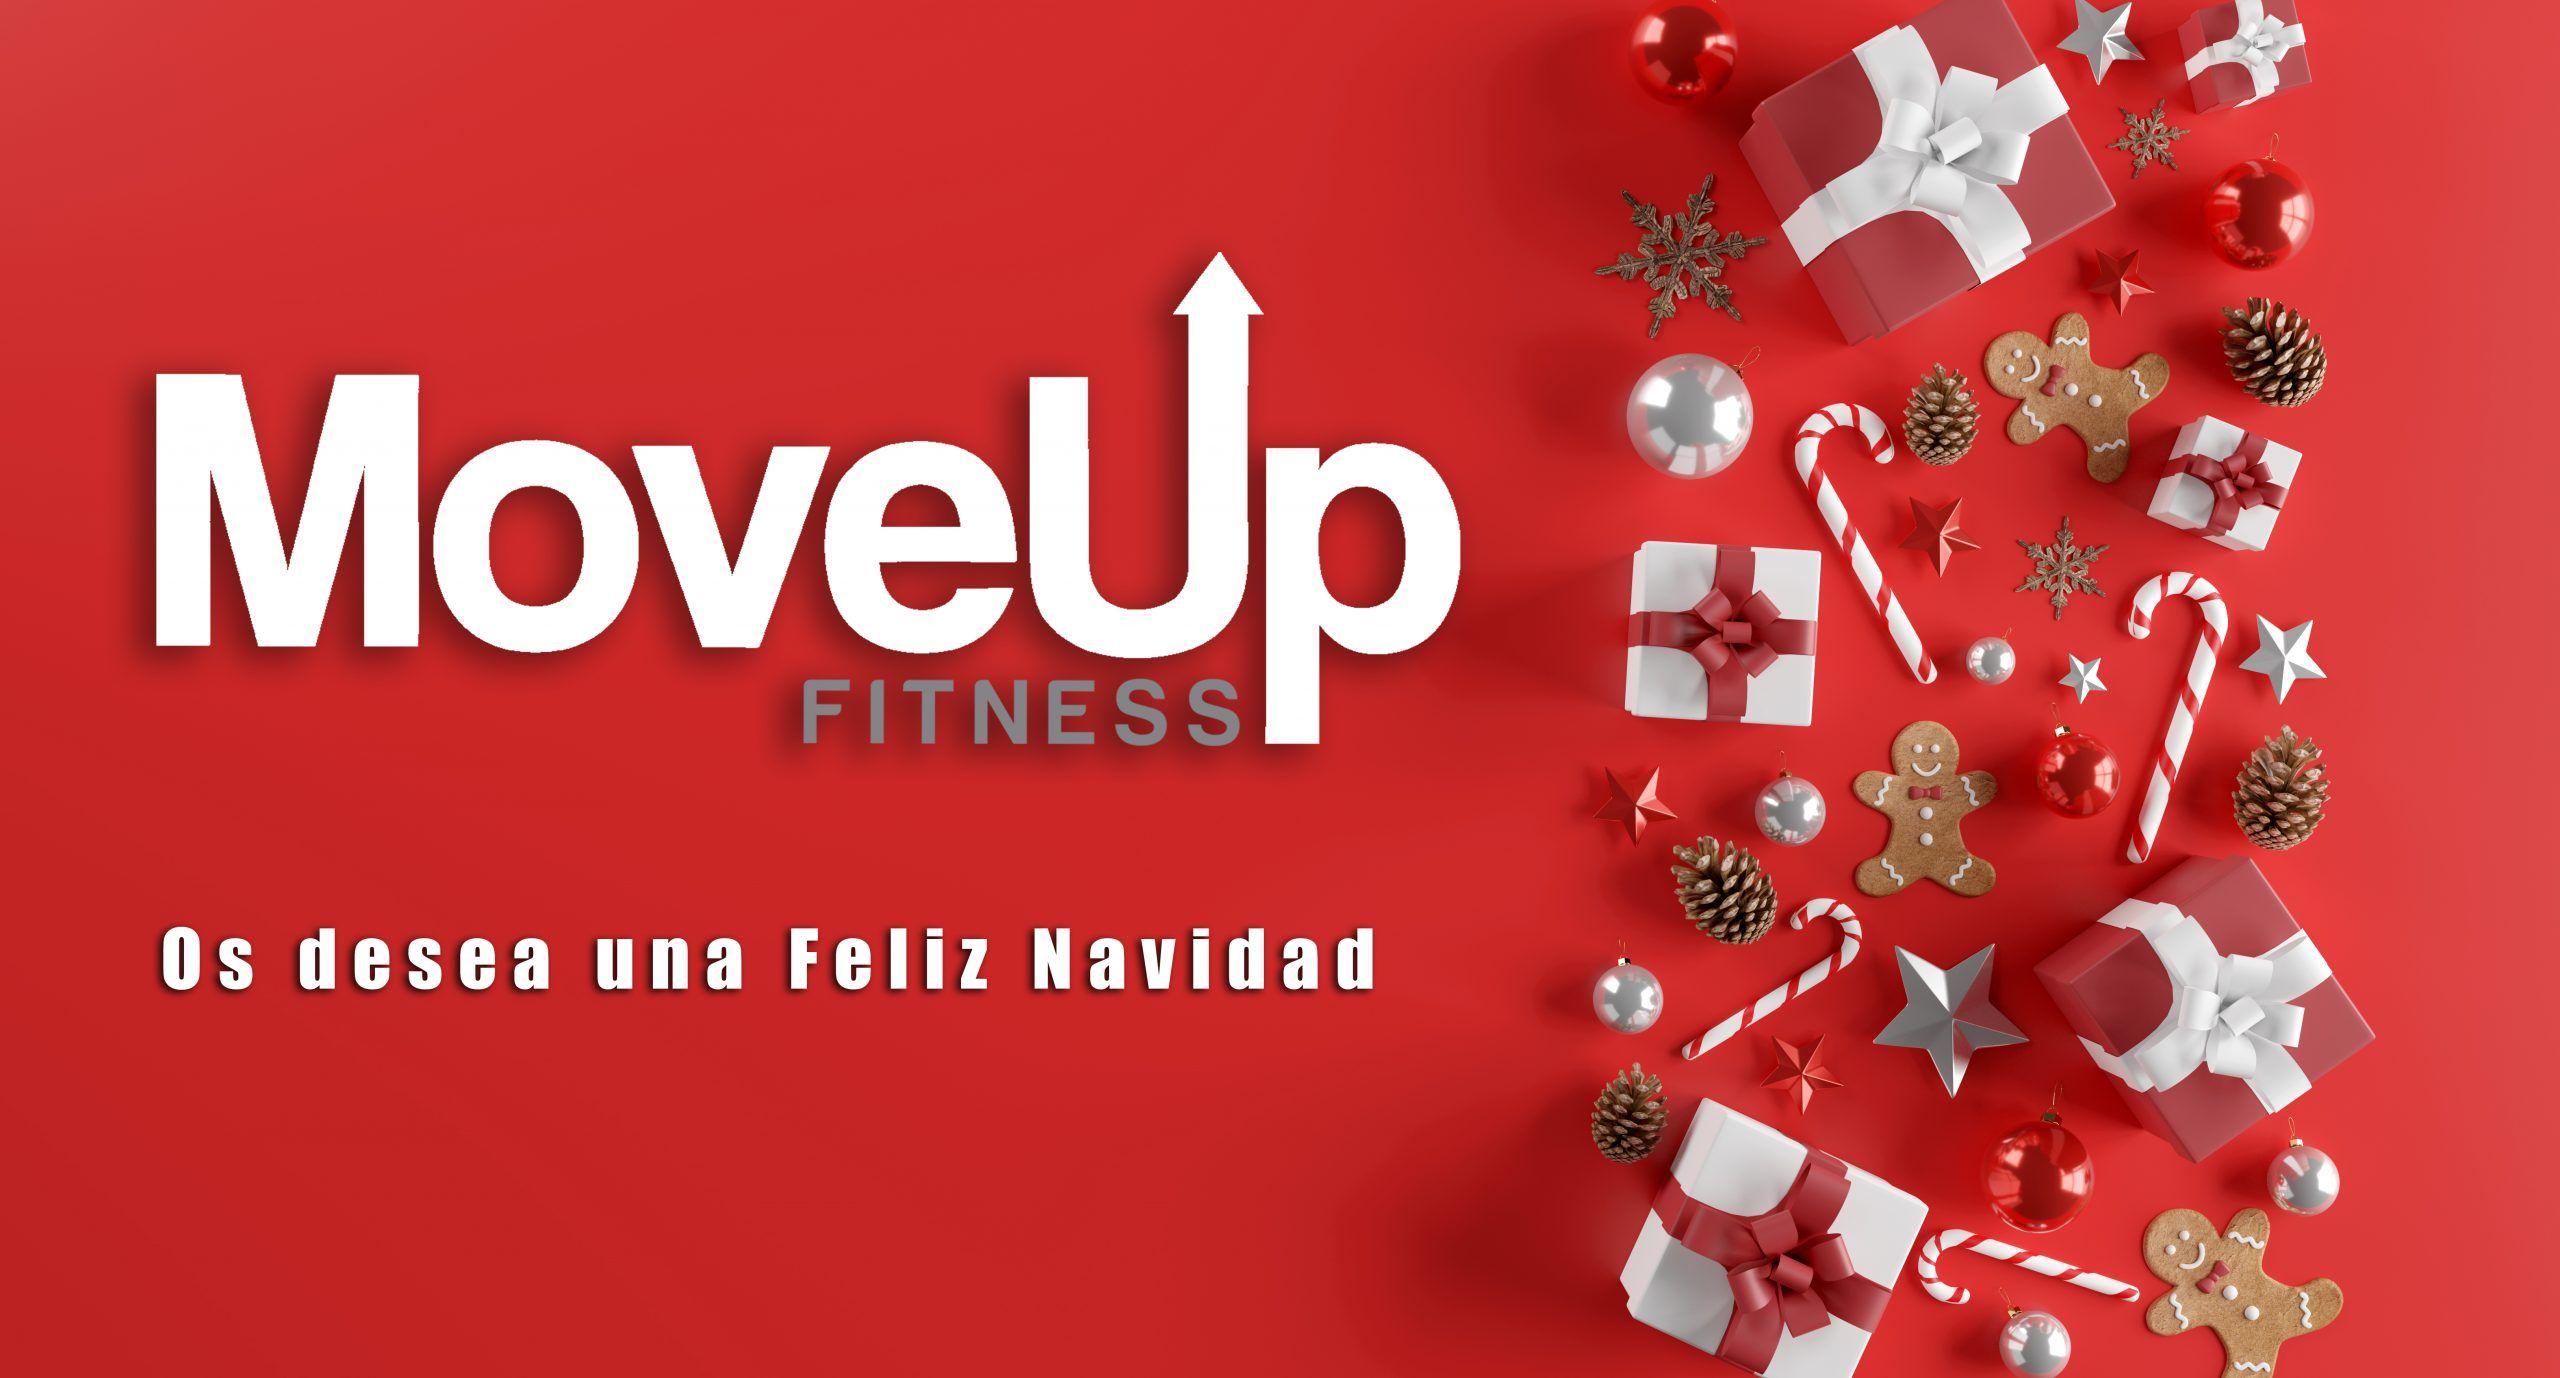 inicio gimnasio fitness move up gimnasio en tres cantos fitnessmoveup - Move up navidad scaled - Inicio